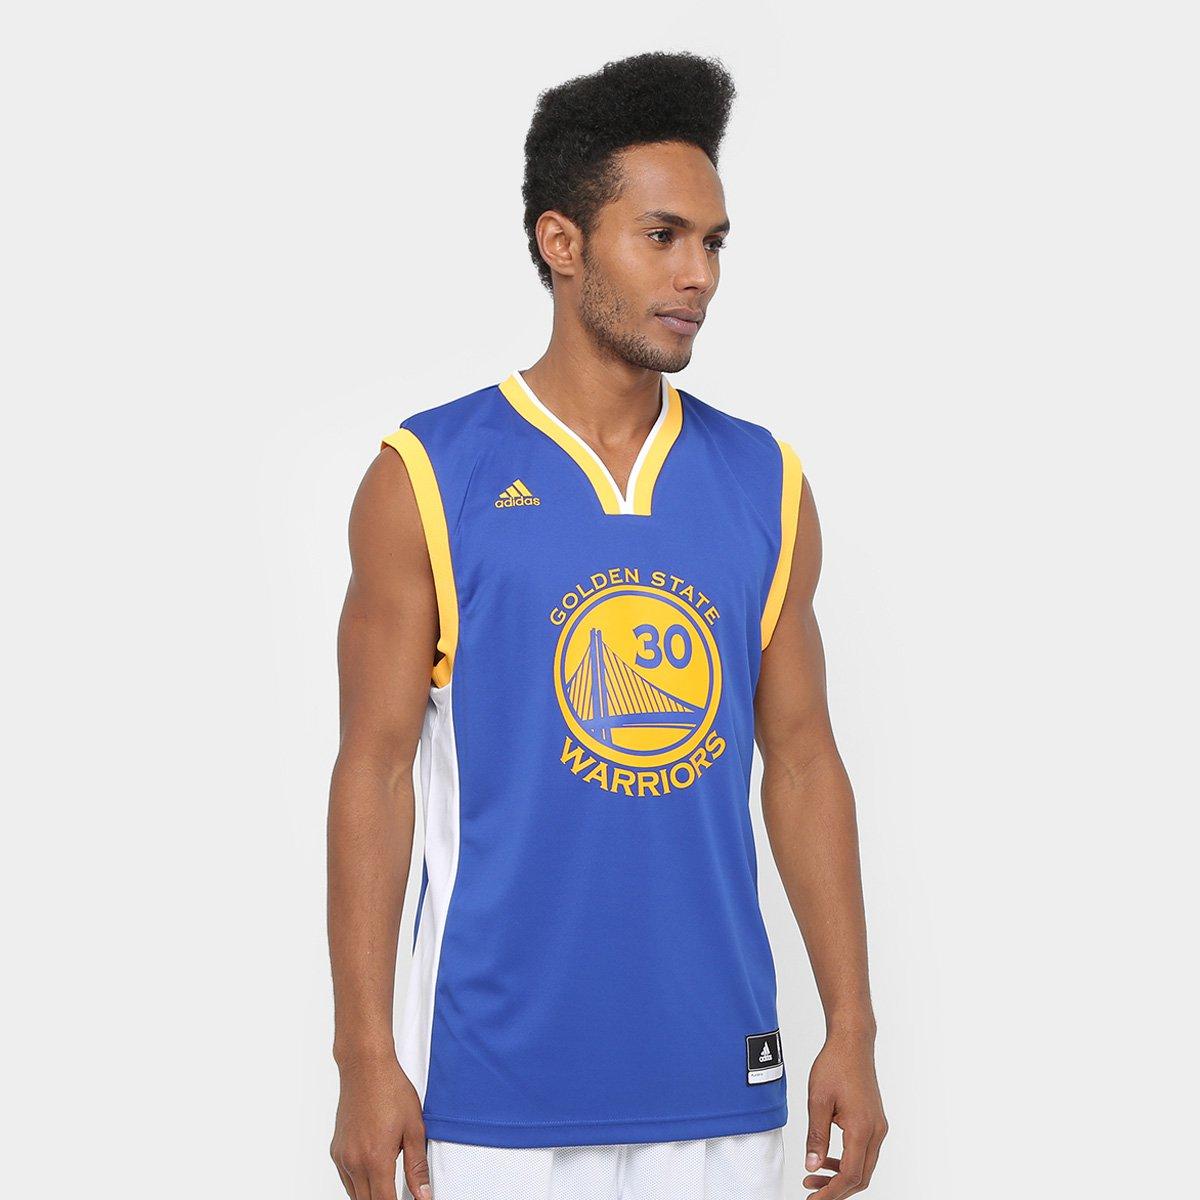 7a214b633 Camiseta Regata Adidas NBA Golden State Warriors Curry Masculina - Compre  Agora